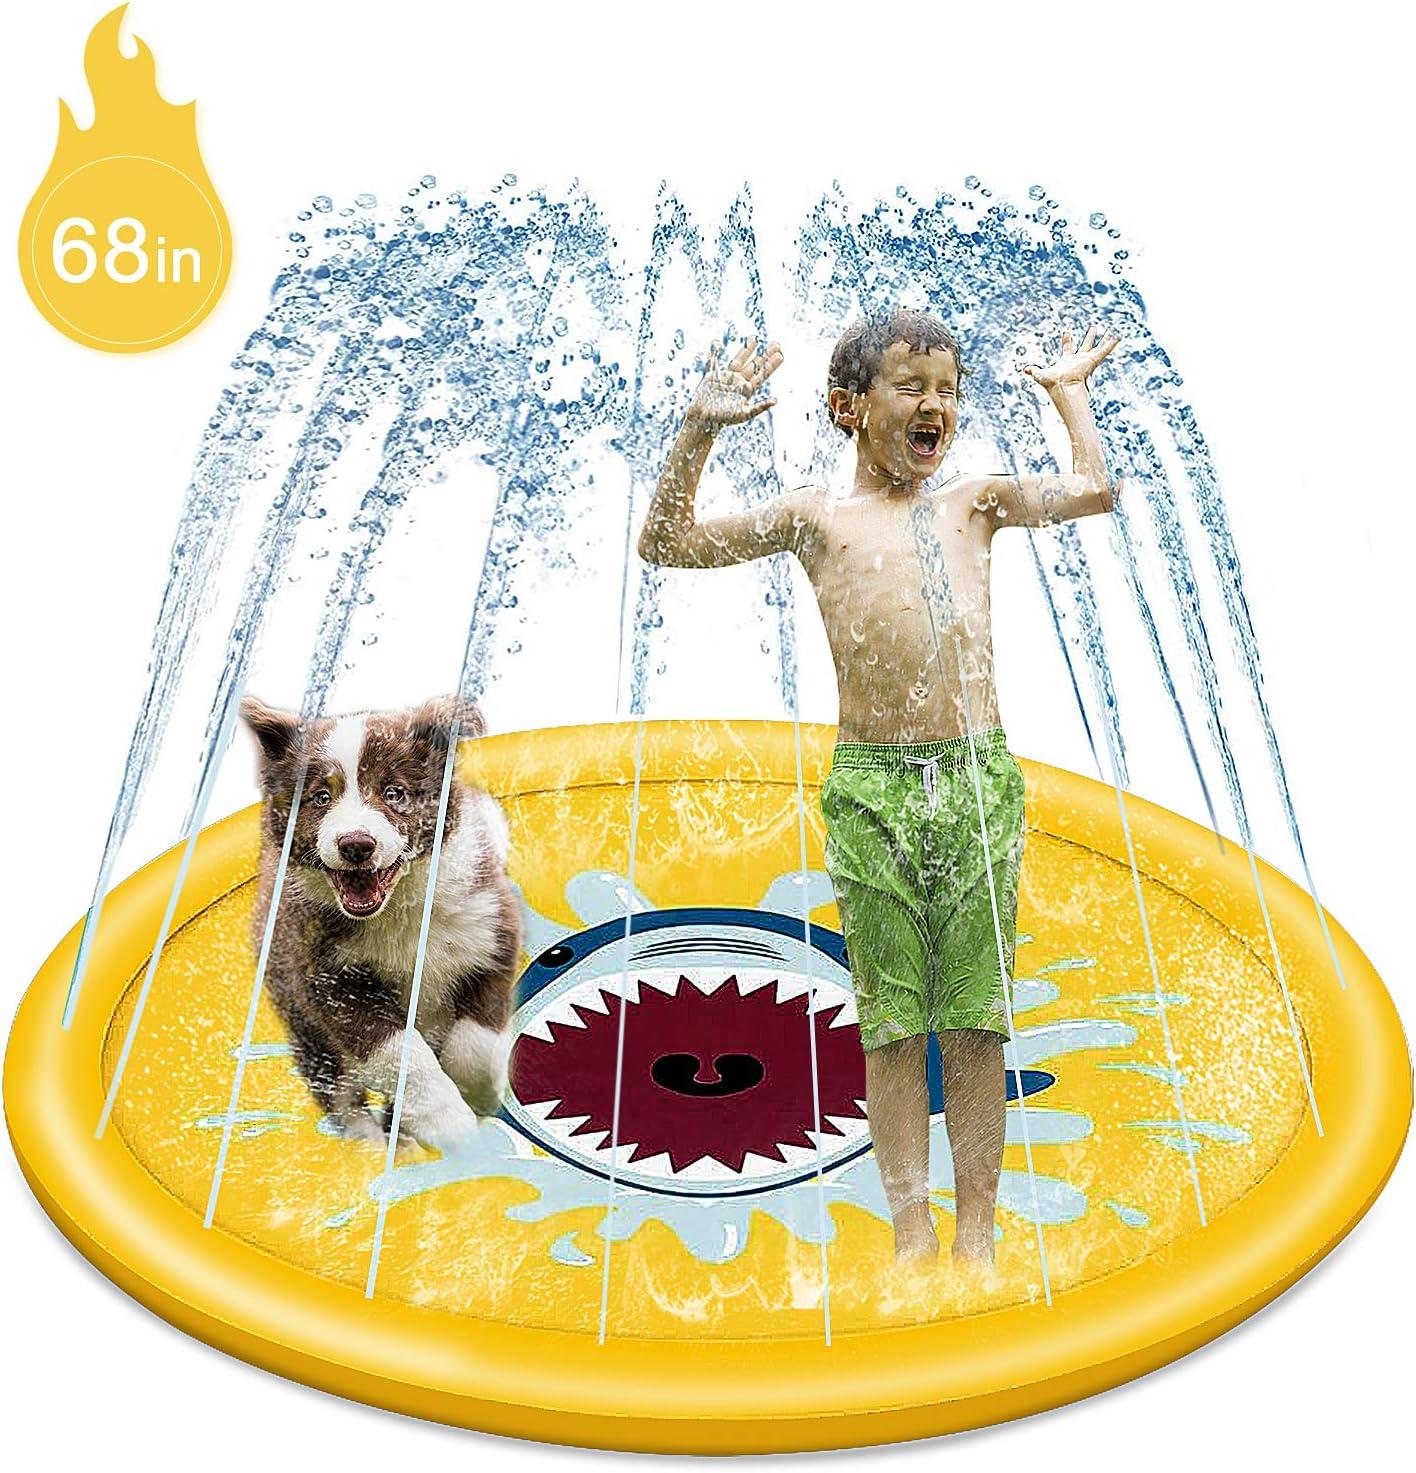 68 inch Inflatable Splash Sprinkler Pad,Summer Outdoor Sprinkler Pad Toy,for Kids Toddler Pool Dog Wading Pool Splash Play Mat Yellow Shark